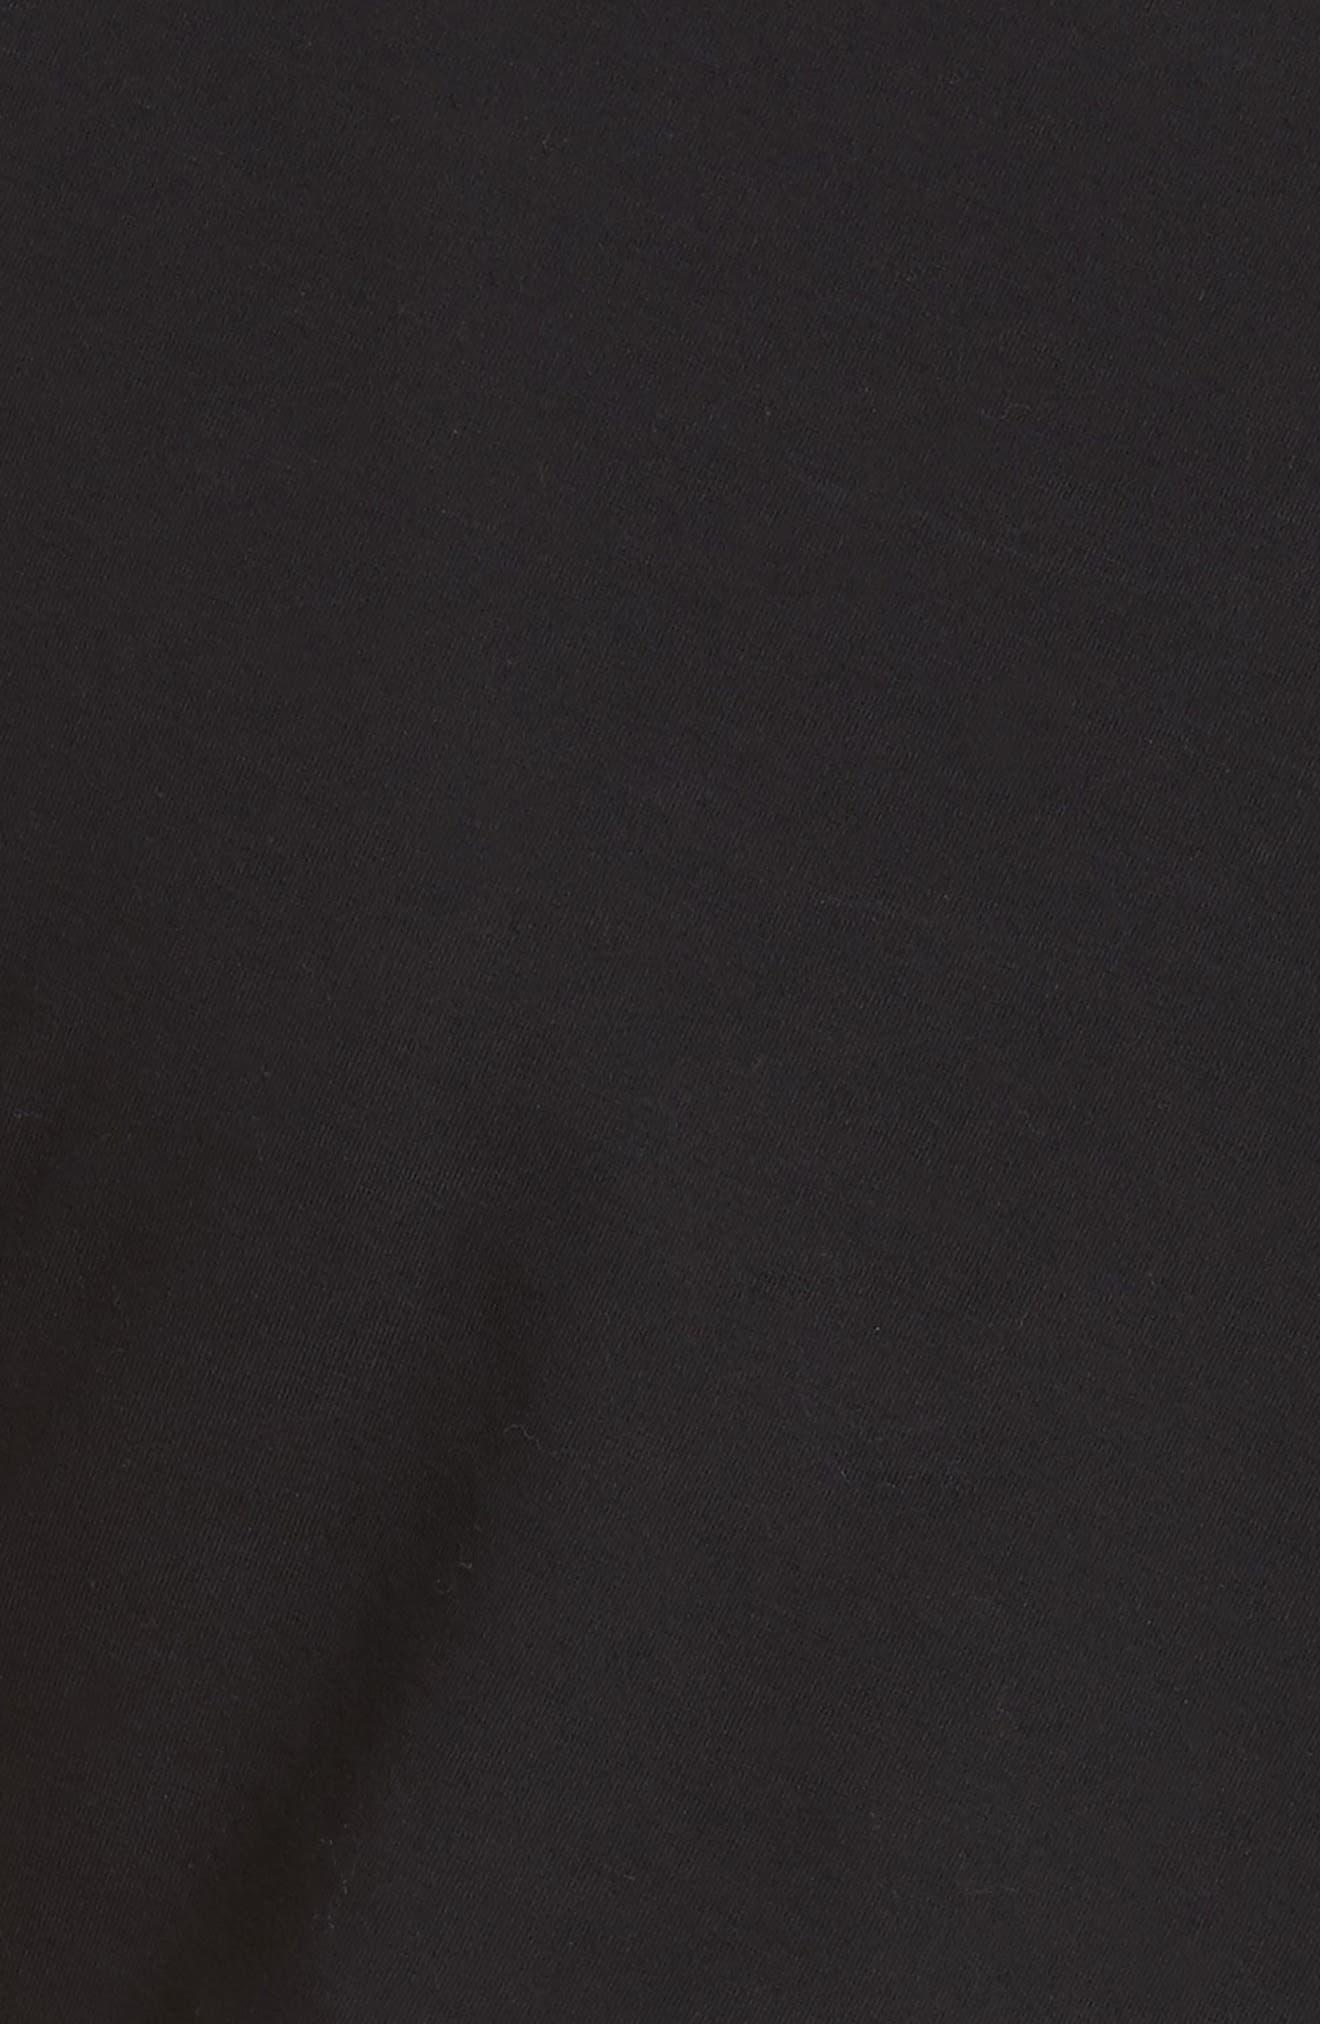 Knot Detail Dress,                             Alternate thumbnail 5, color,                             001